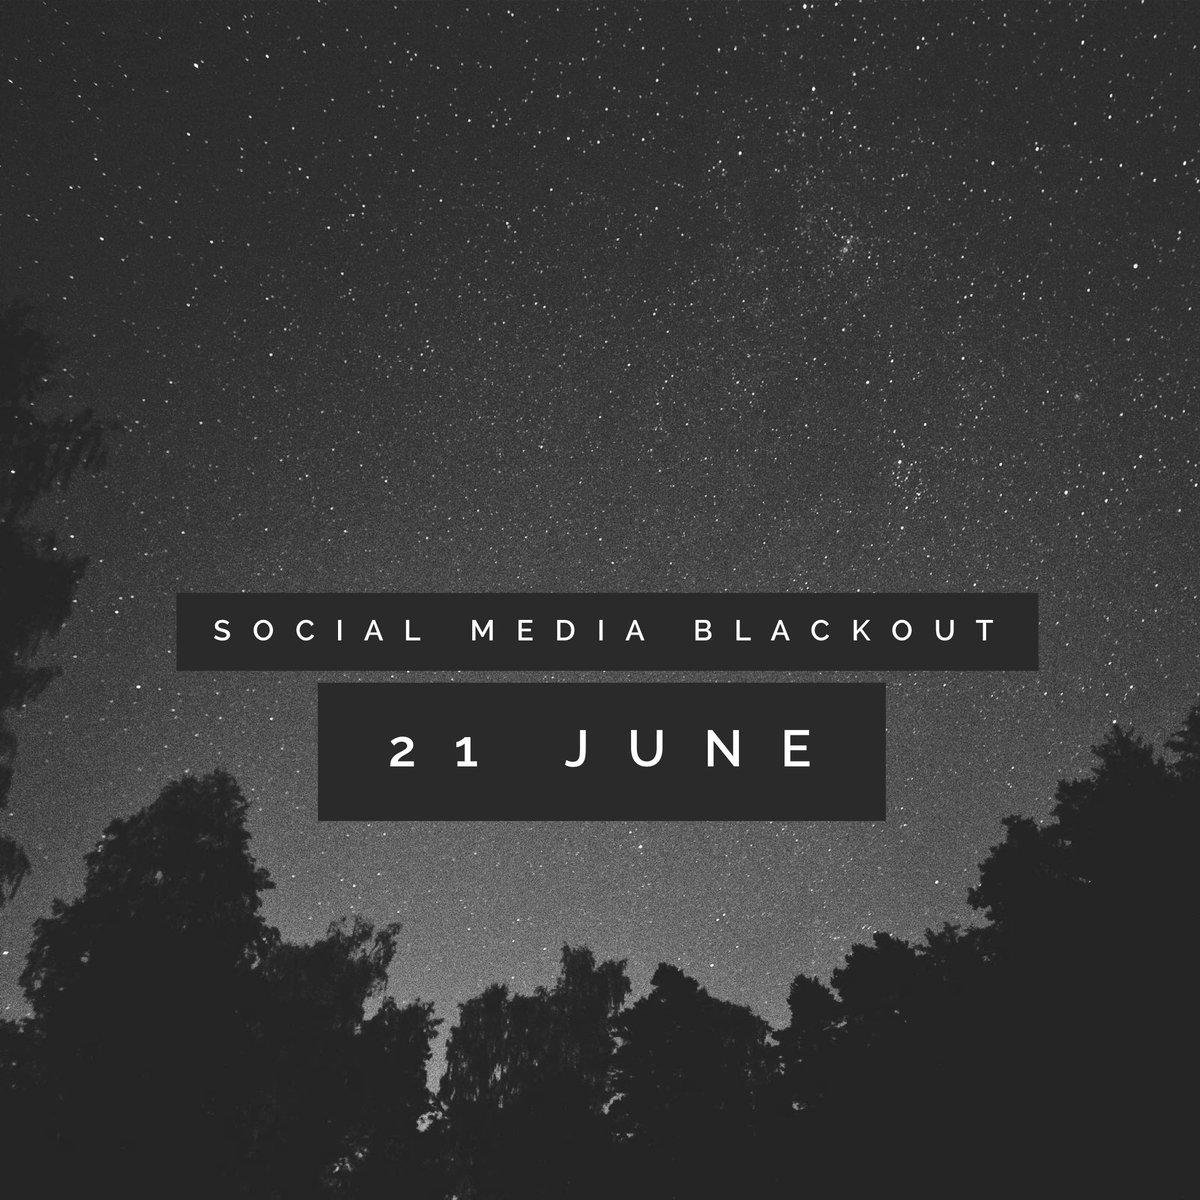 social-media-blackout-2017